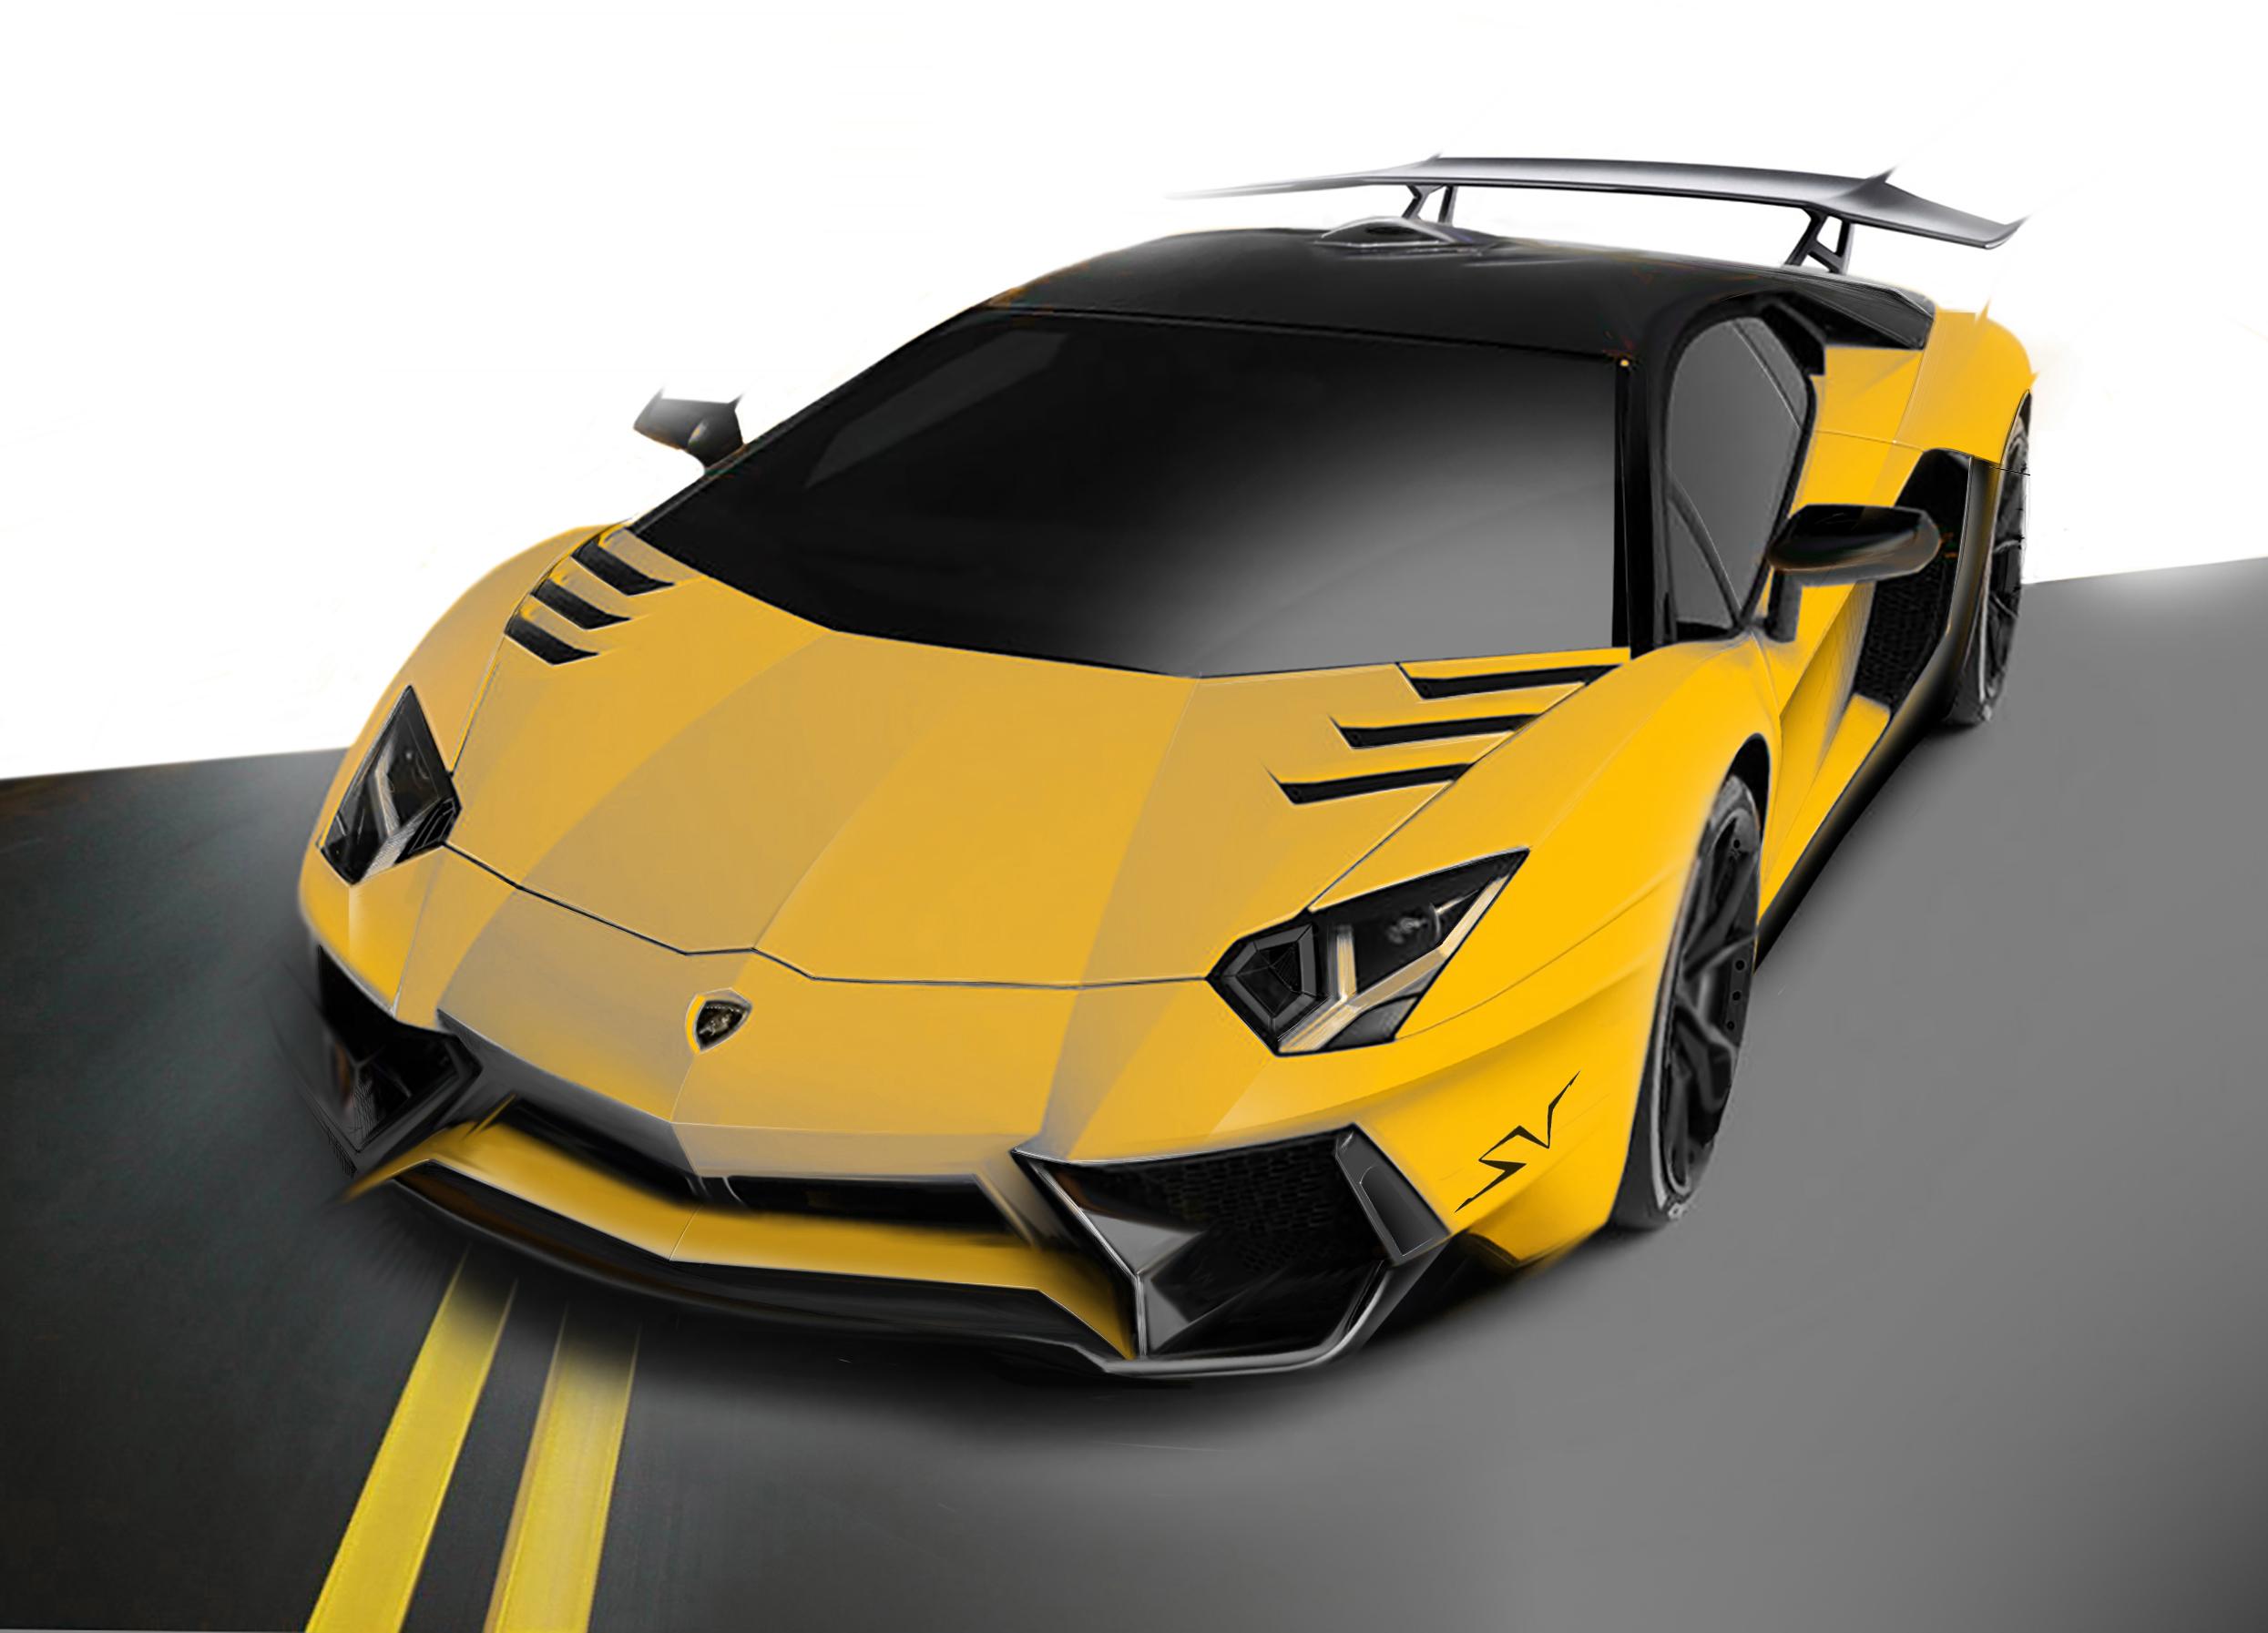 Lamborghini Aventador SV Ad Personam | Design Proposal on Behance